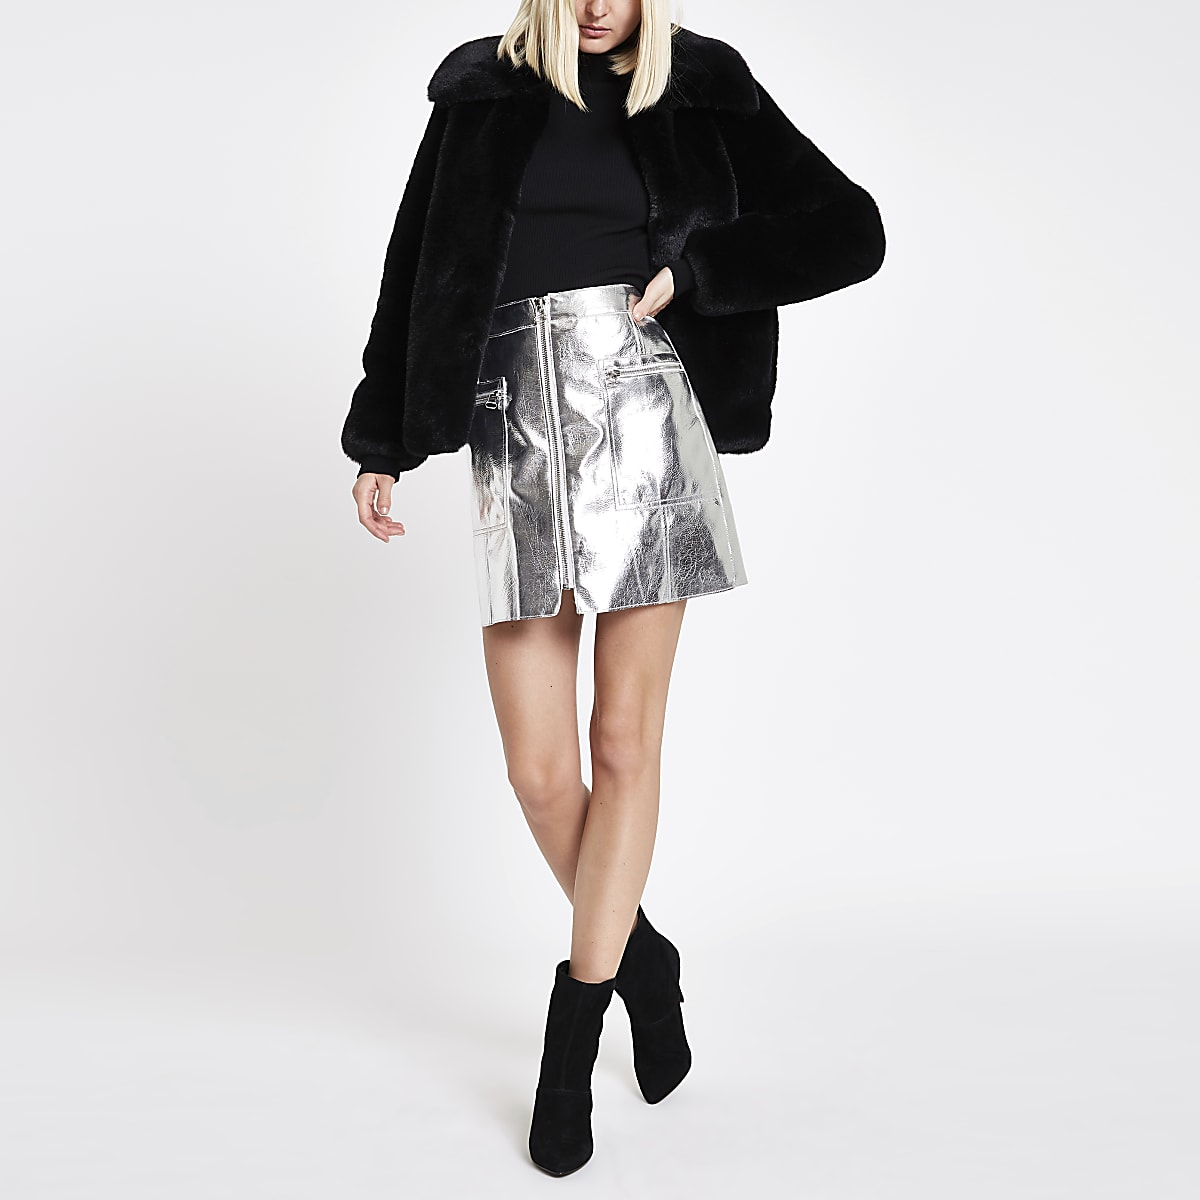 Silver metallic biker mini skirt